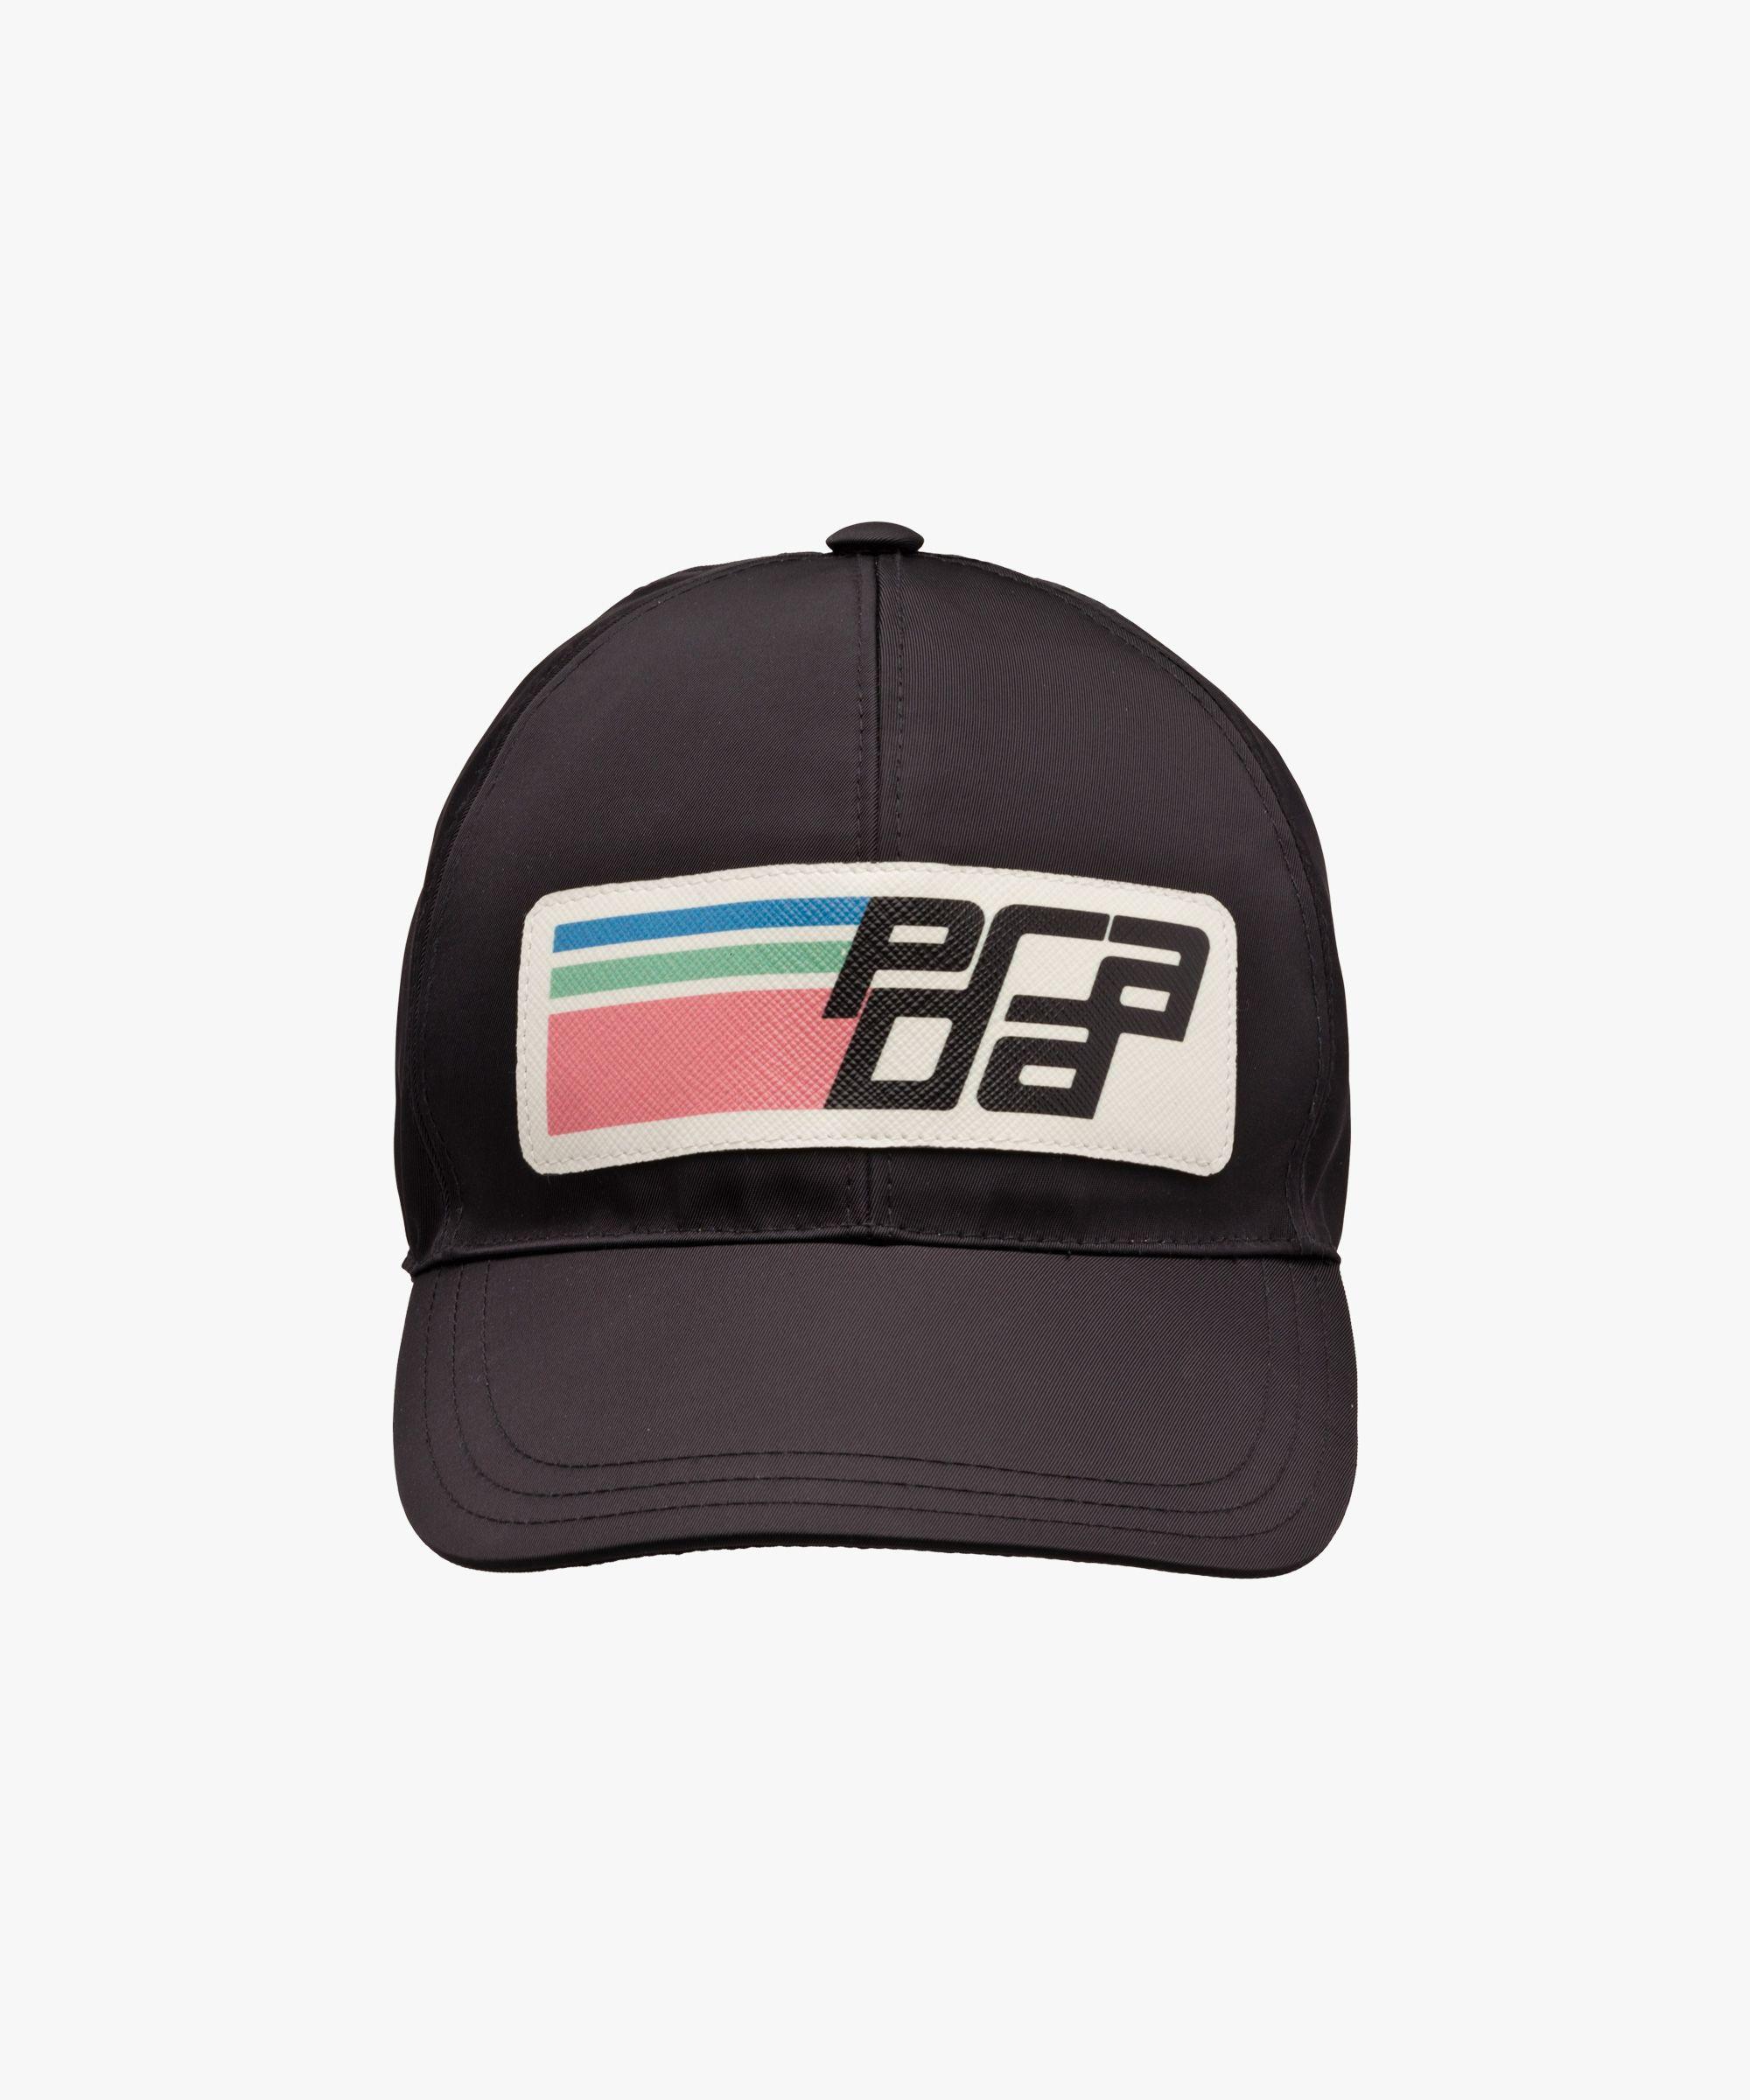 36a4c507fc1 Prada - Black nylon logo baseball cap